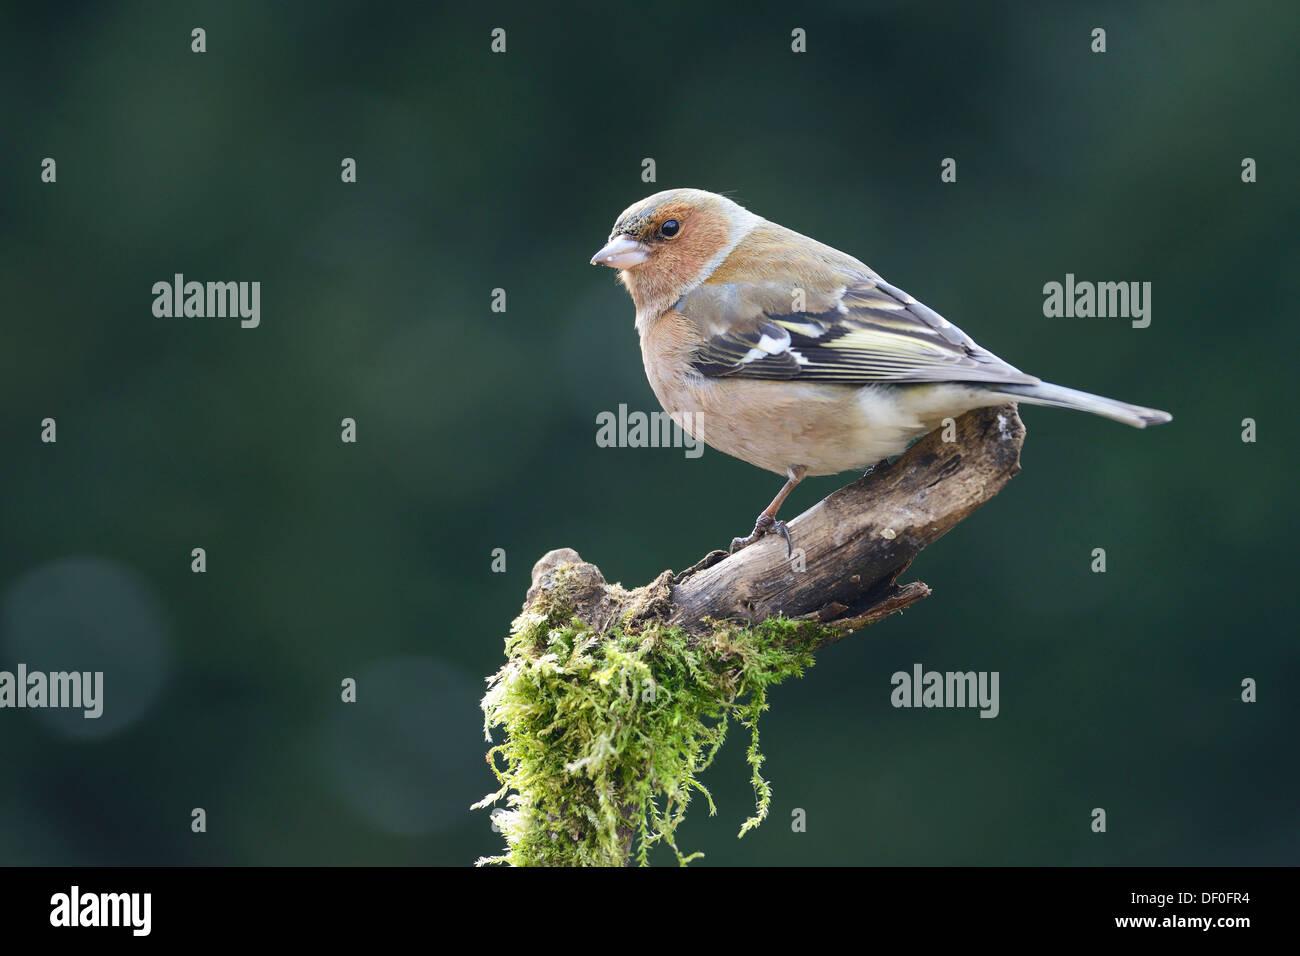 Chaffinch (Fringilla coelebs), male, Haren, Emsland, Lower Saxony, Germany - Stock Image